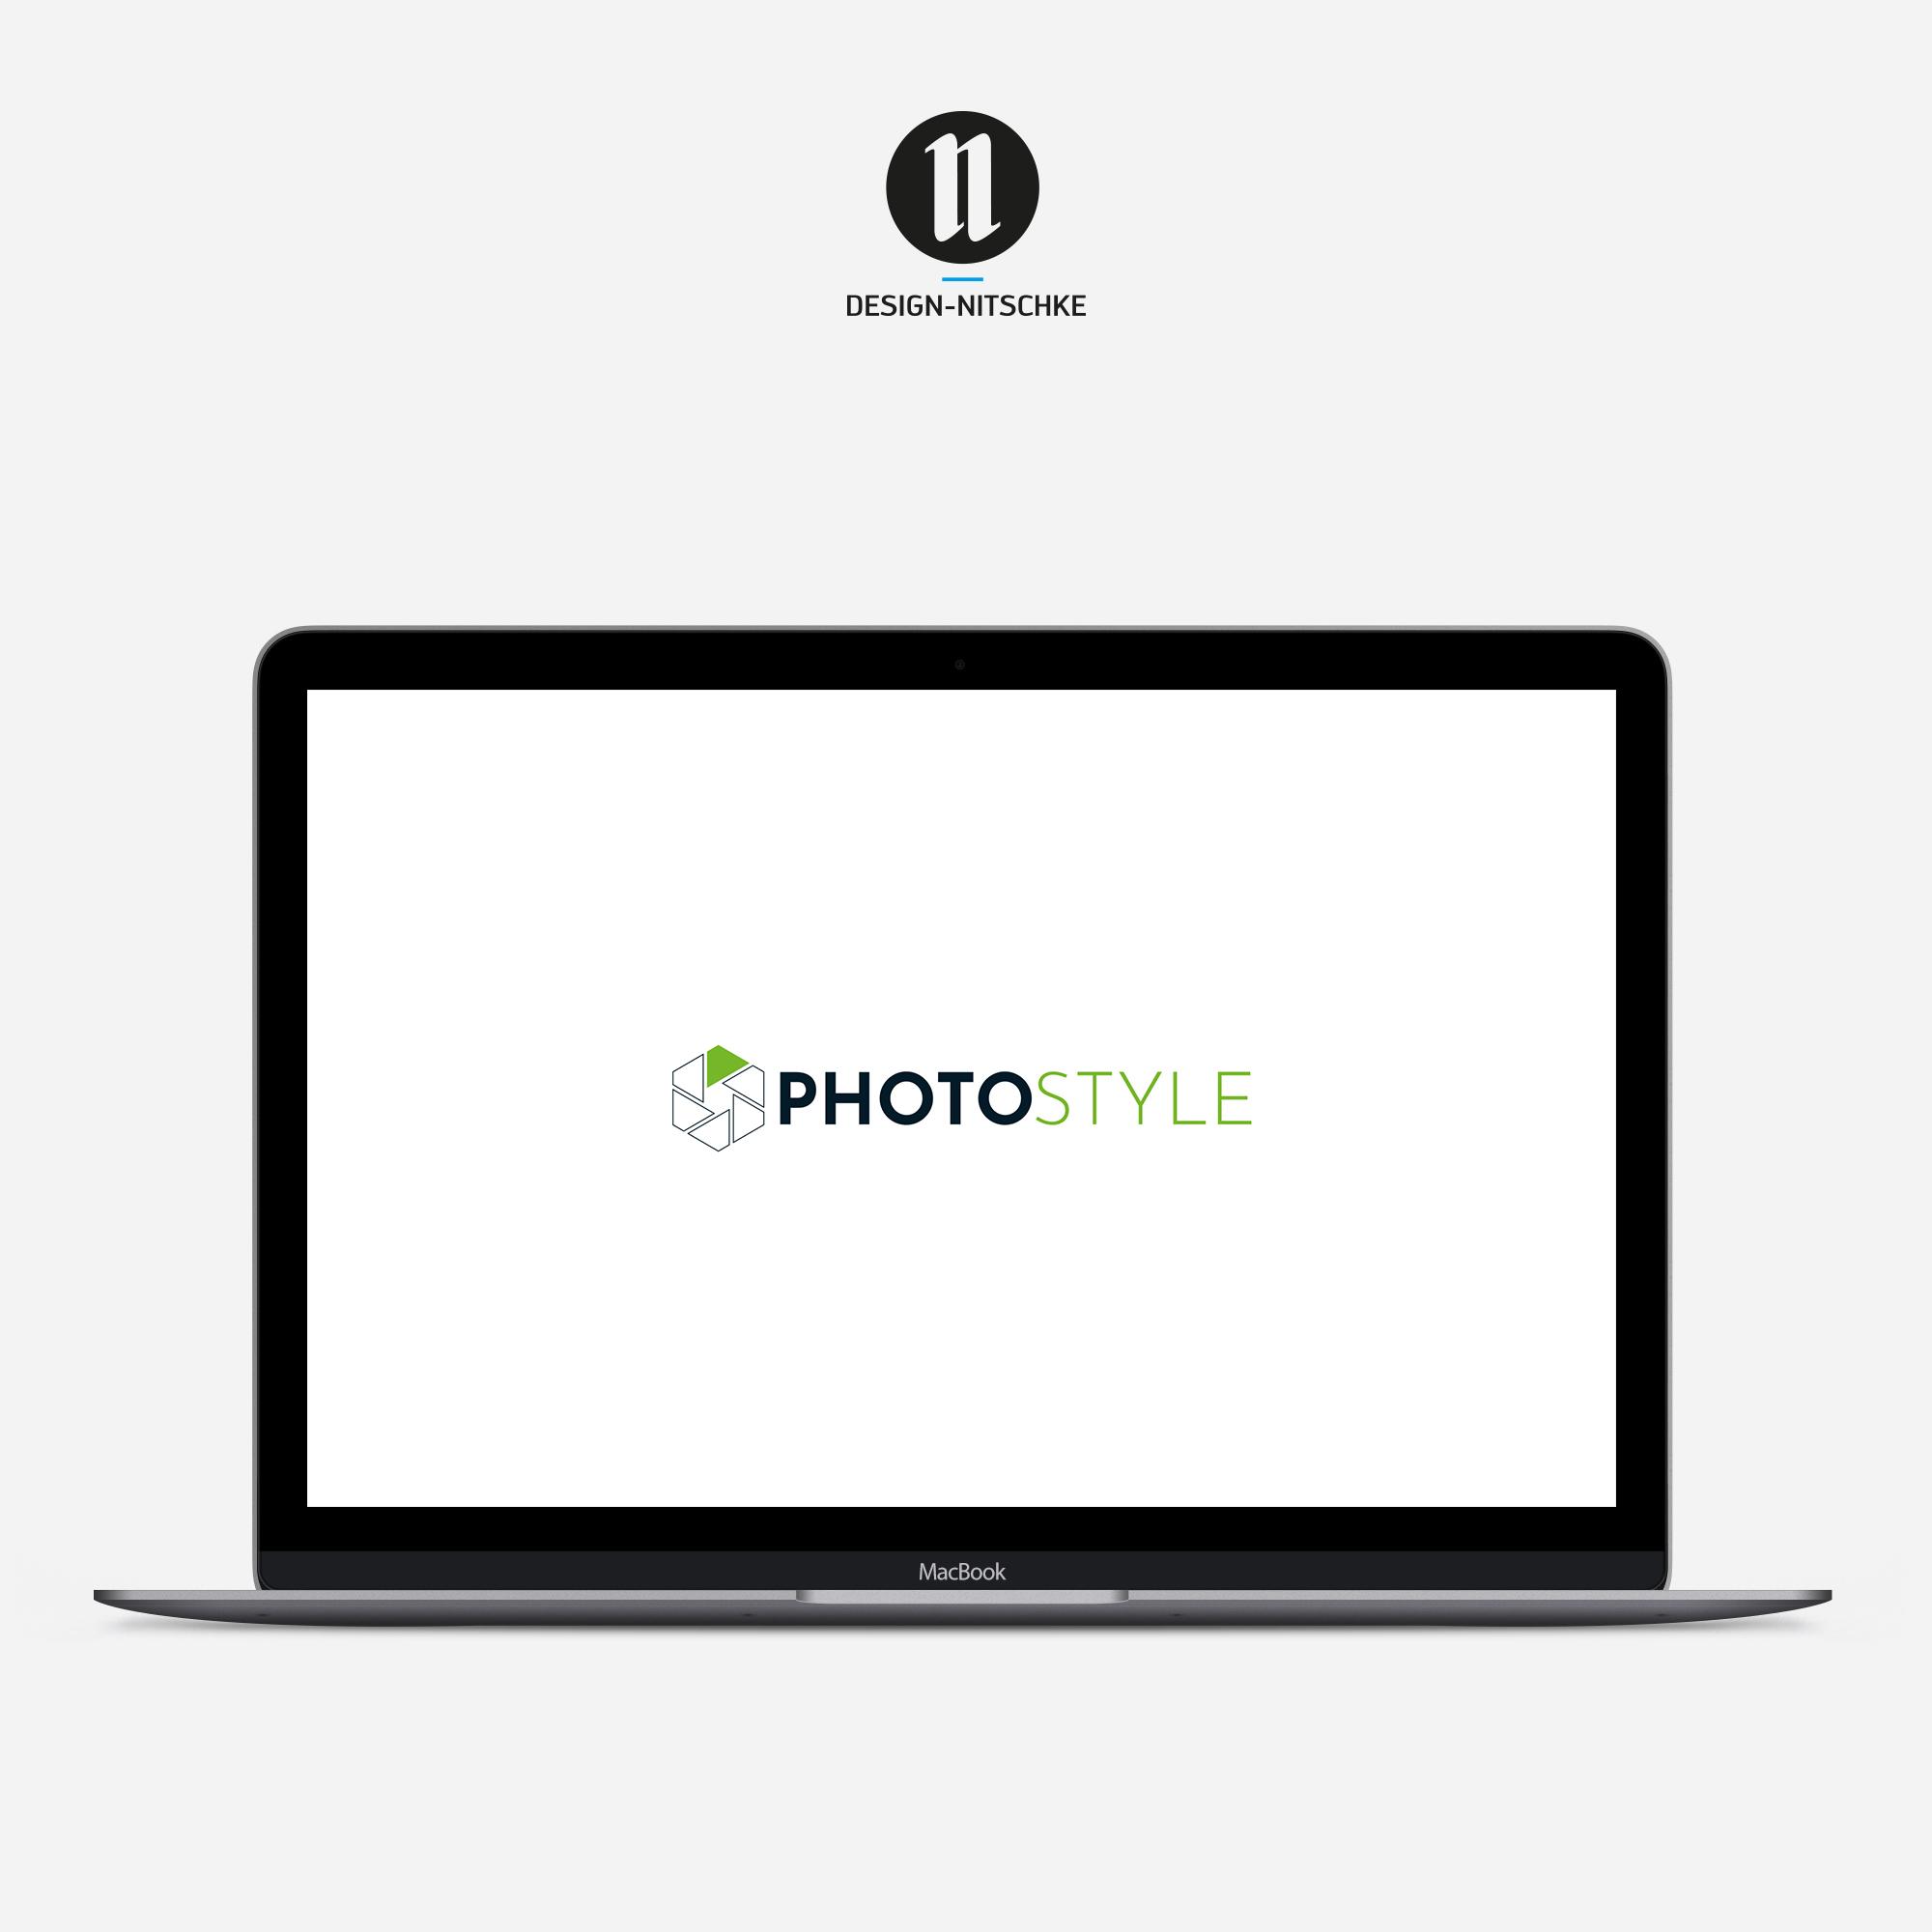 fotostudio_oranienburg_design_logo_nitschke.jpg